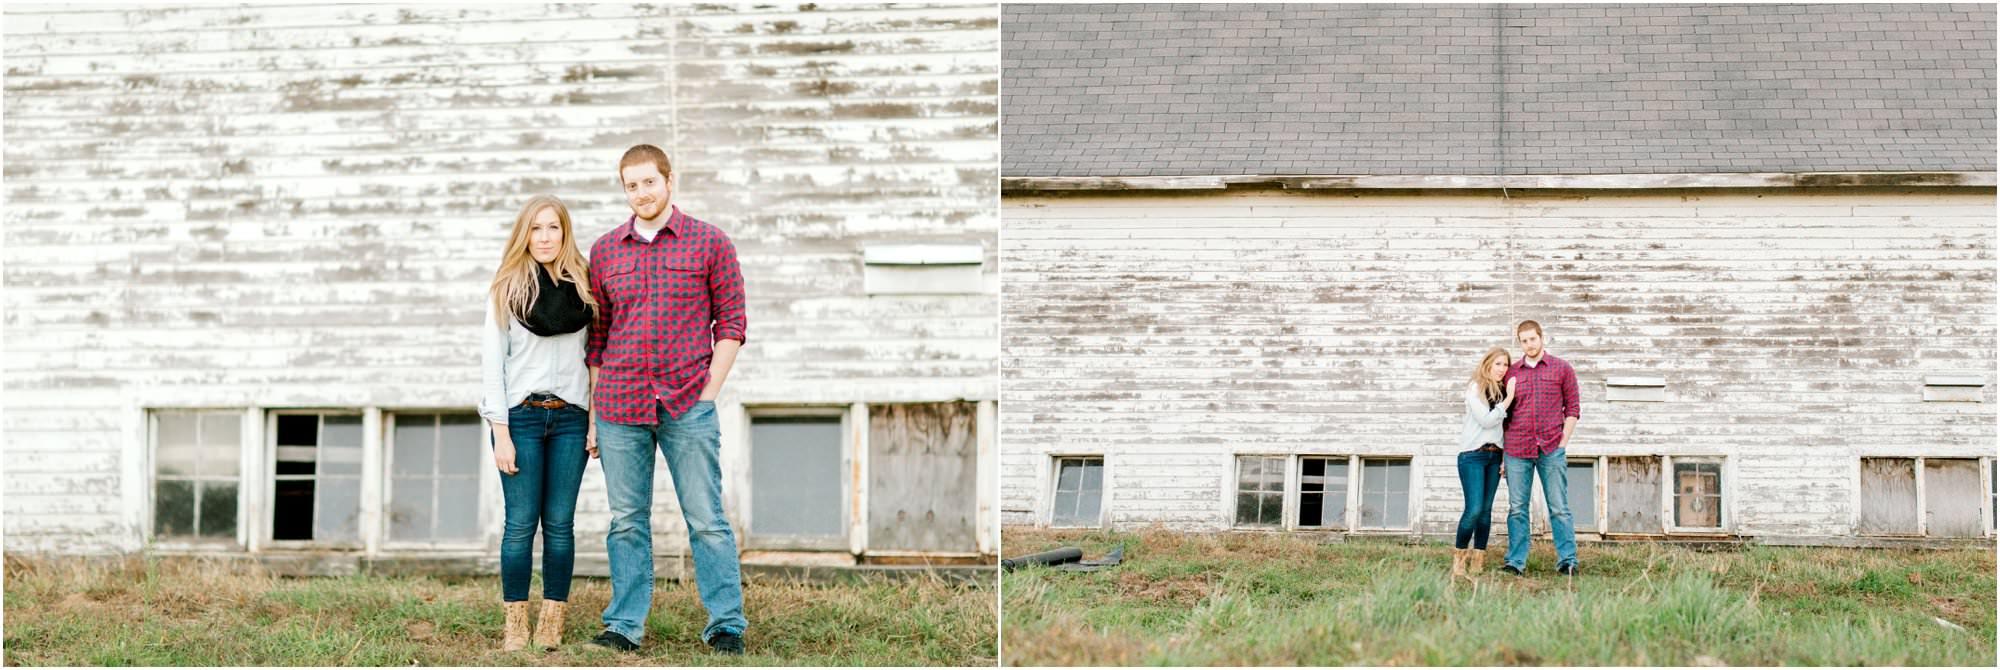 rustic farm engagement connecticut wedding photographers